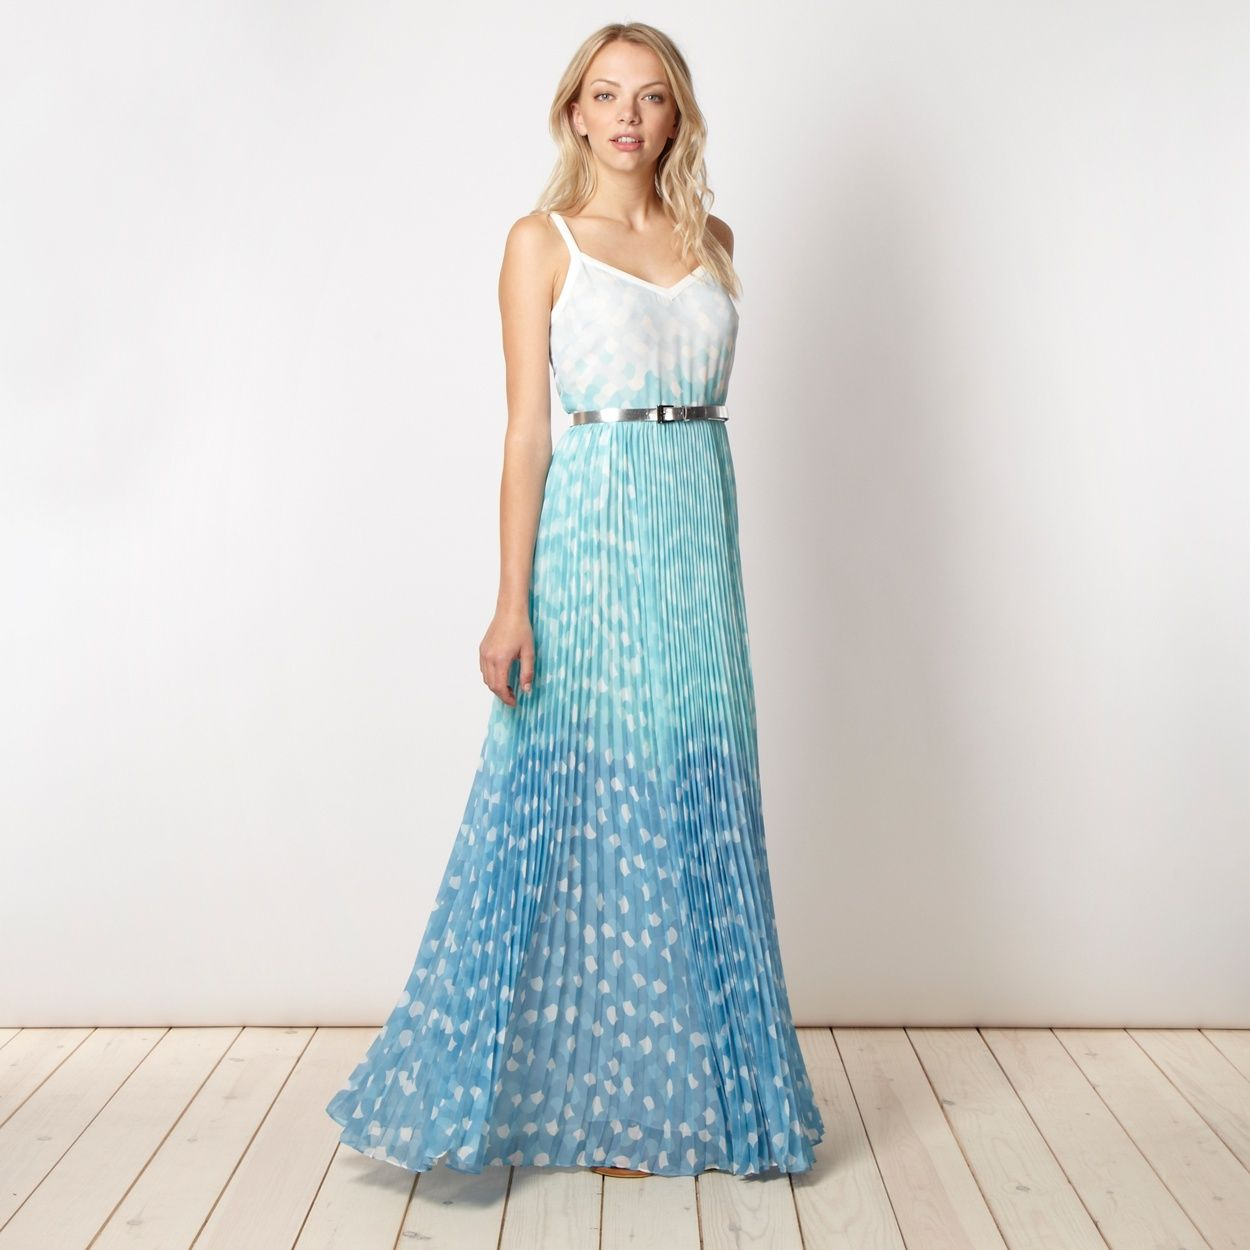 Jonathan saundersedition designer blue ombre maxi dress at jonathan saundersedition designer blue ombre maxi dress at debenhams ombrellifo Gallery